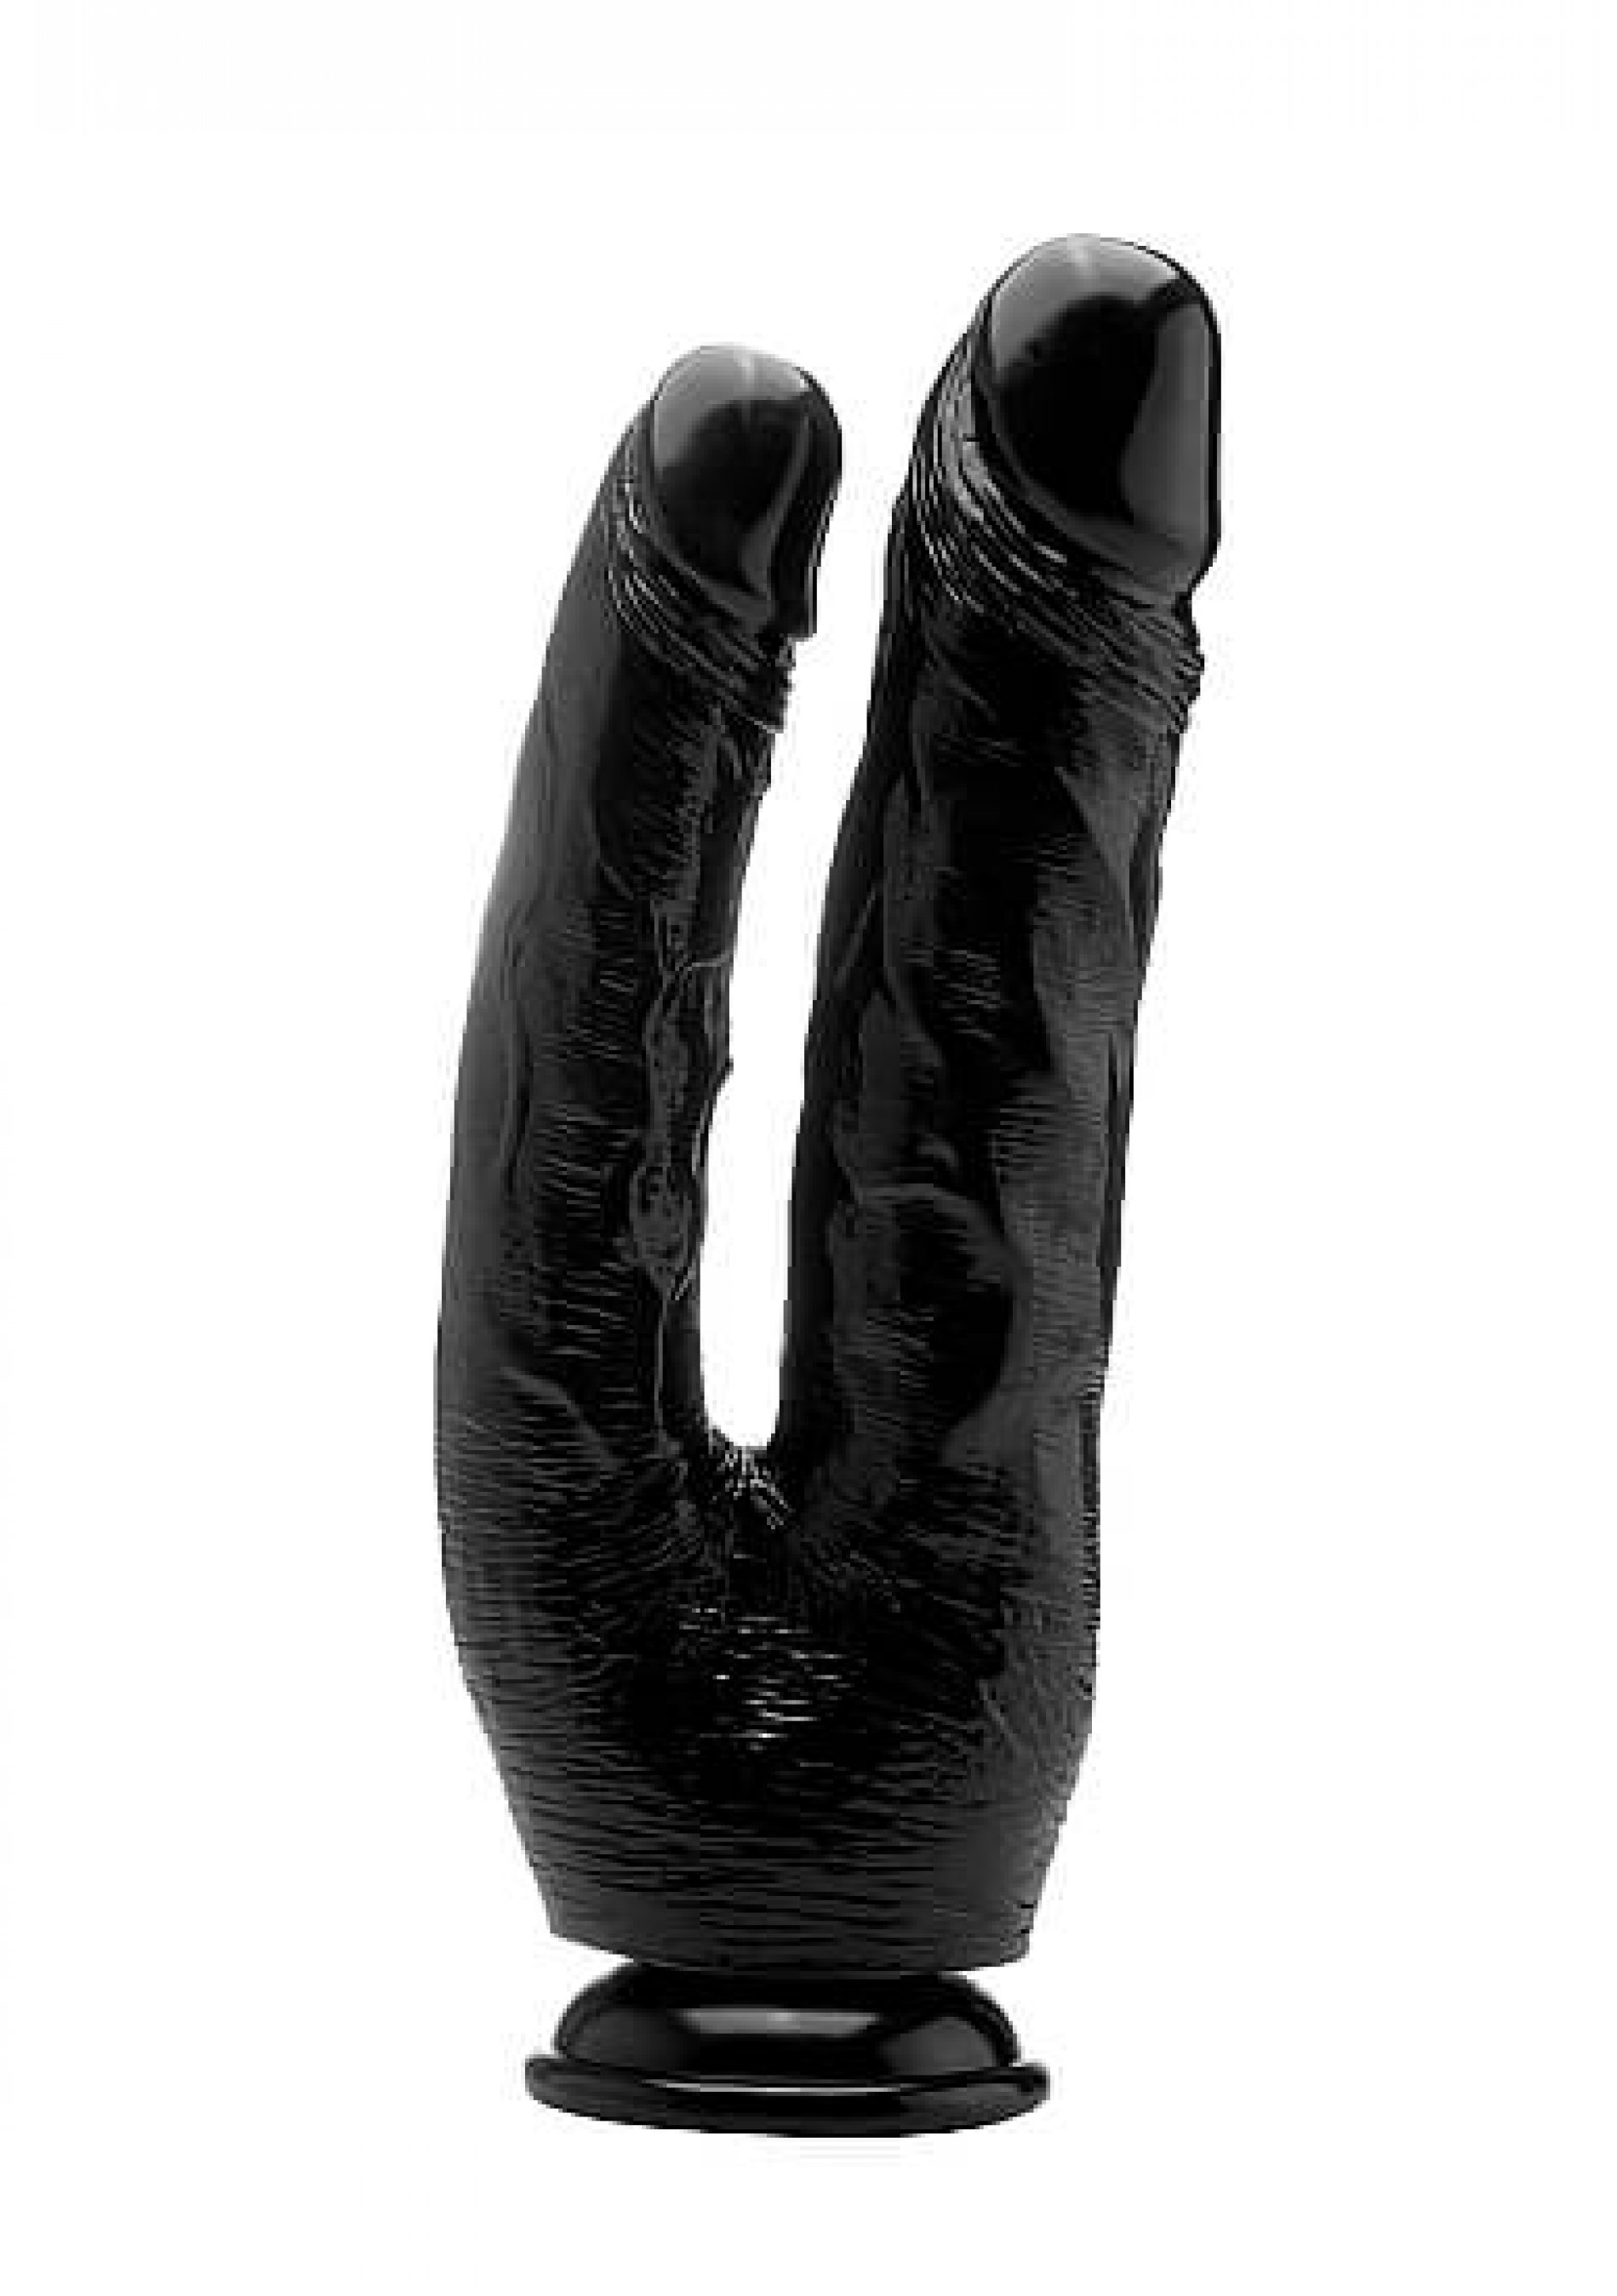 Realrock Realistic Double cock 25.5 cm black